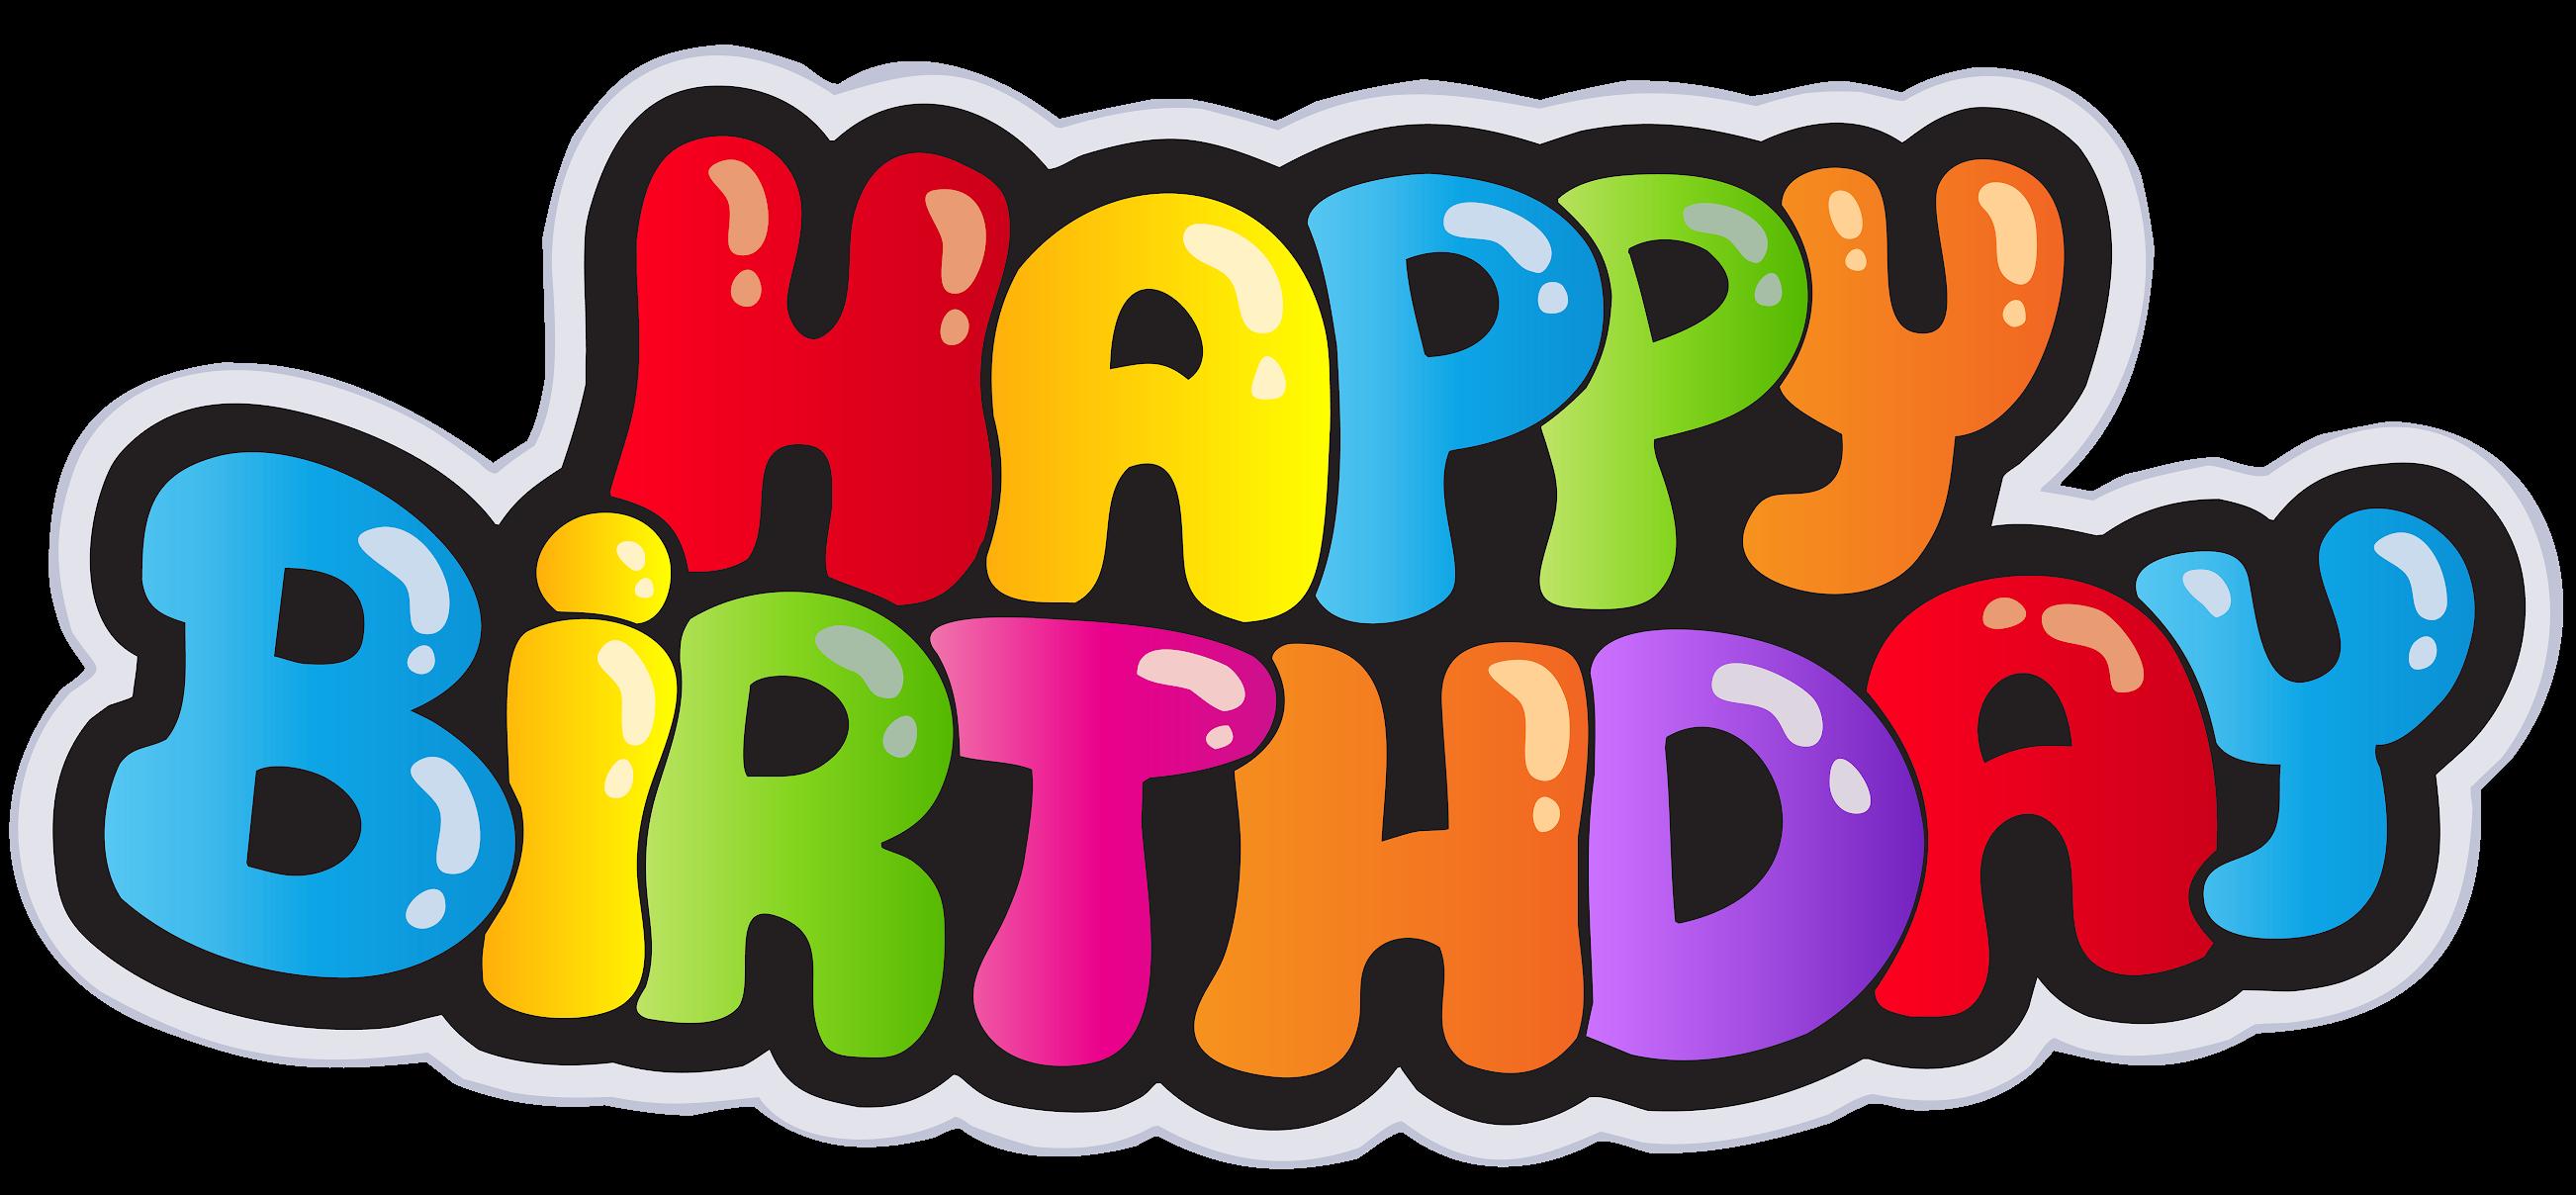 Happy Birthday To You Font Happy Birthday Transparent Png Image Clipart Ulang Tahun Gambar Kartu Ulang Tahun